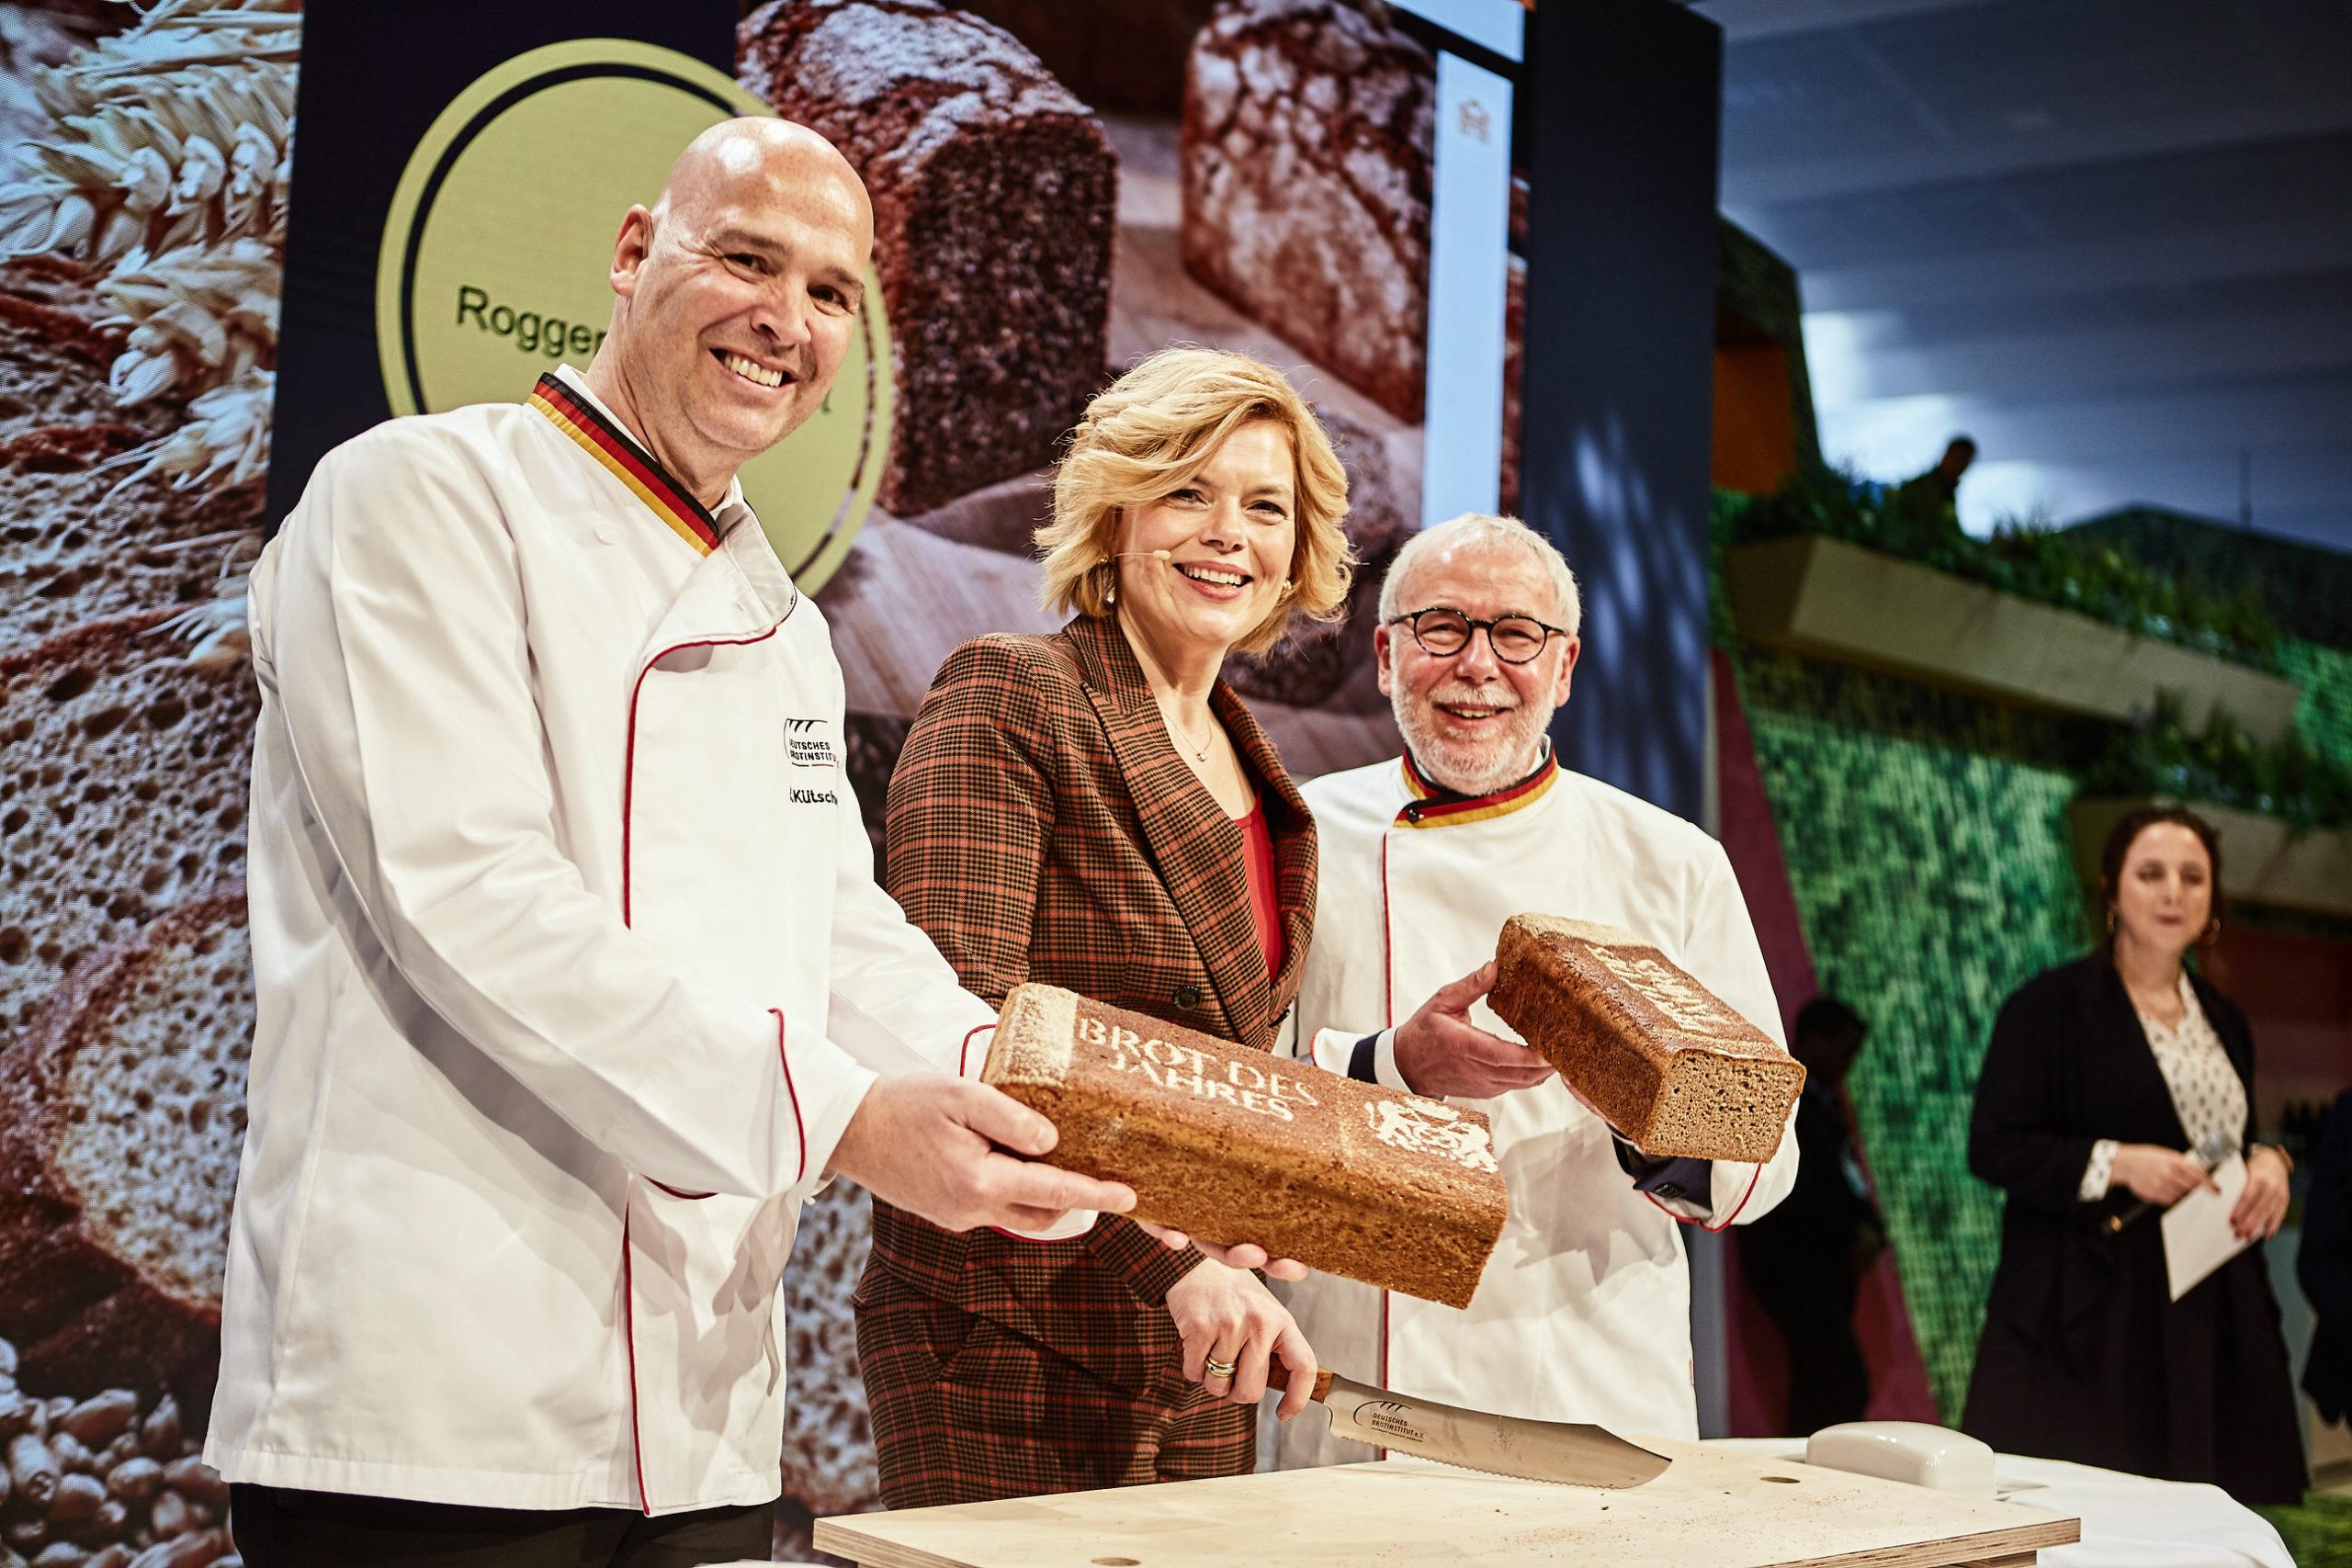 Julia Klöckner enthüllt das Brot des Jahres 2020